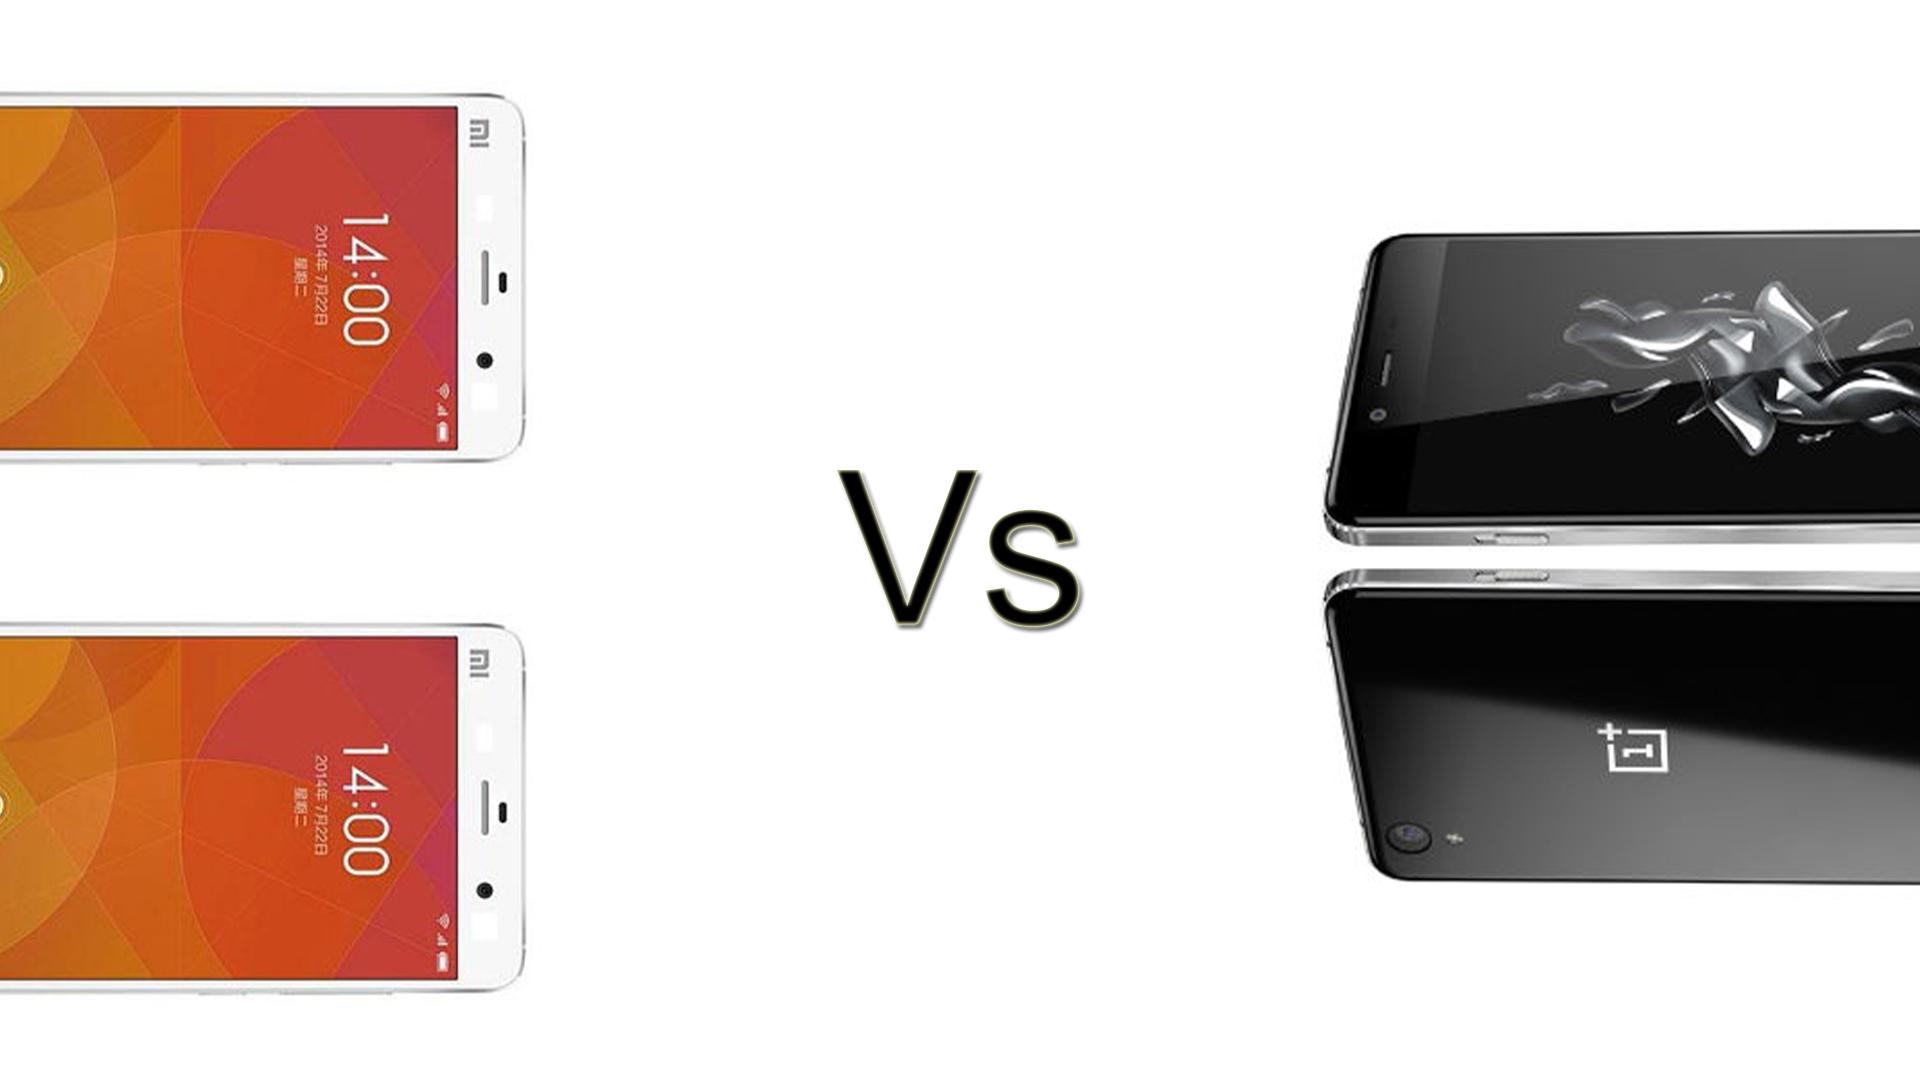 Xiaomi Redmi Note 2 vs OnePlus X